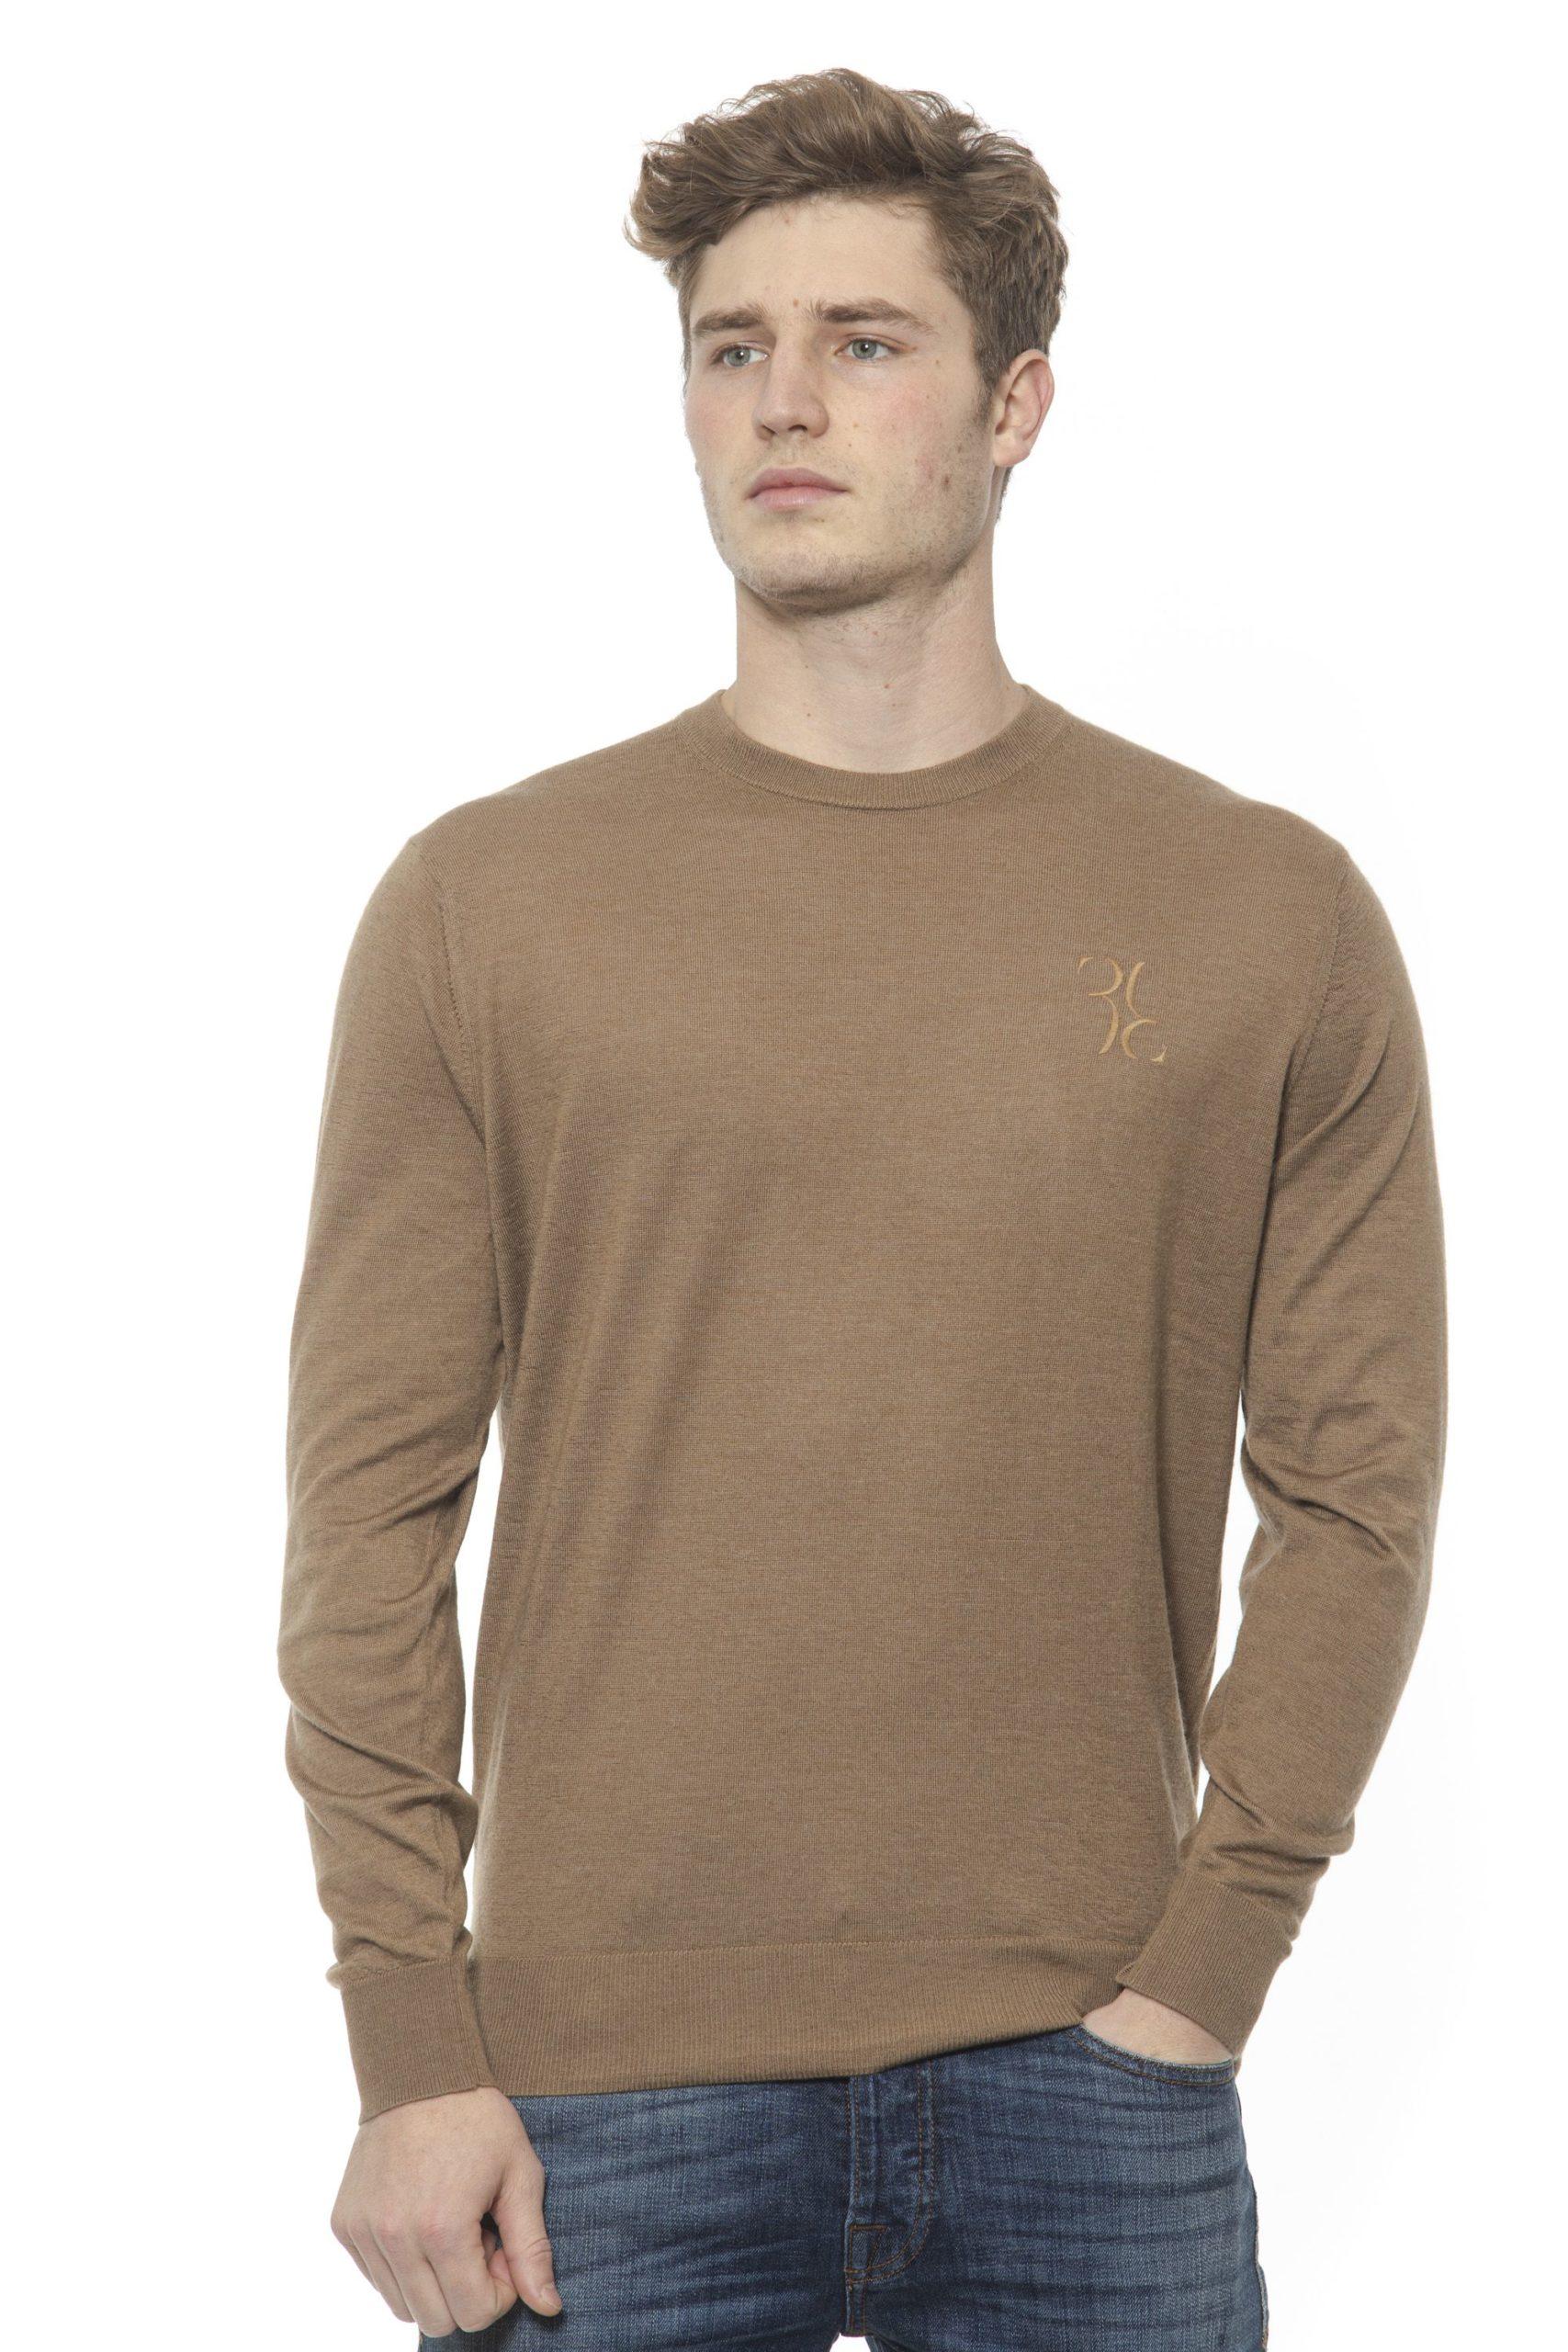 Billionaire Italian Couture Men's Tabacco Sweater Beige BI1313536 - XL